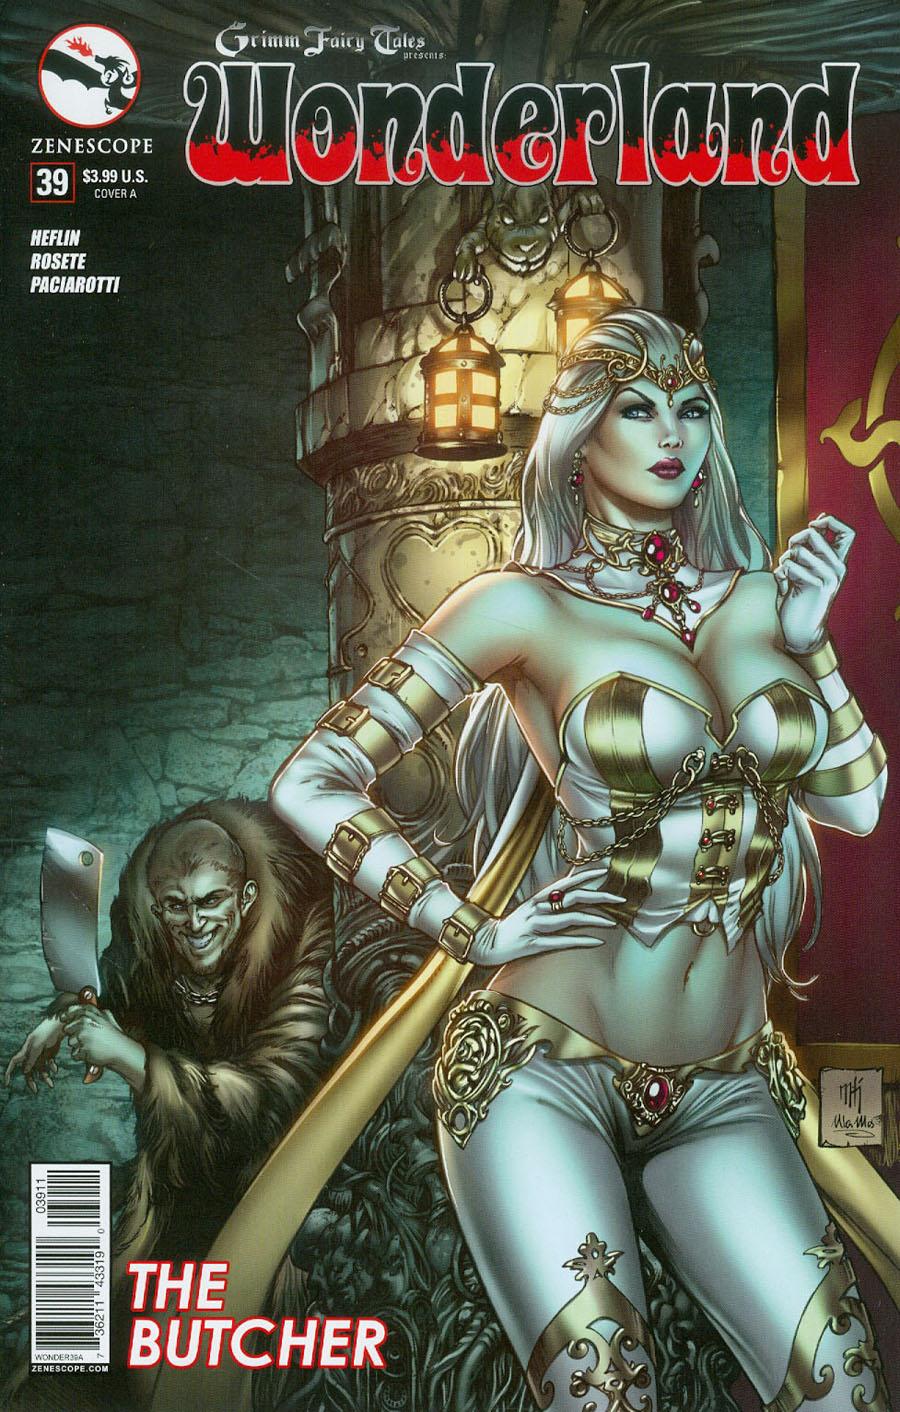 Grimm Fairy Tales Presents Wonderland Vol 2 #39 Cover A Mike Krome